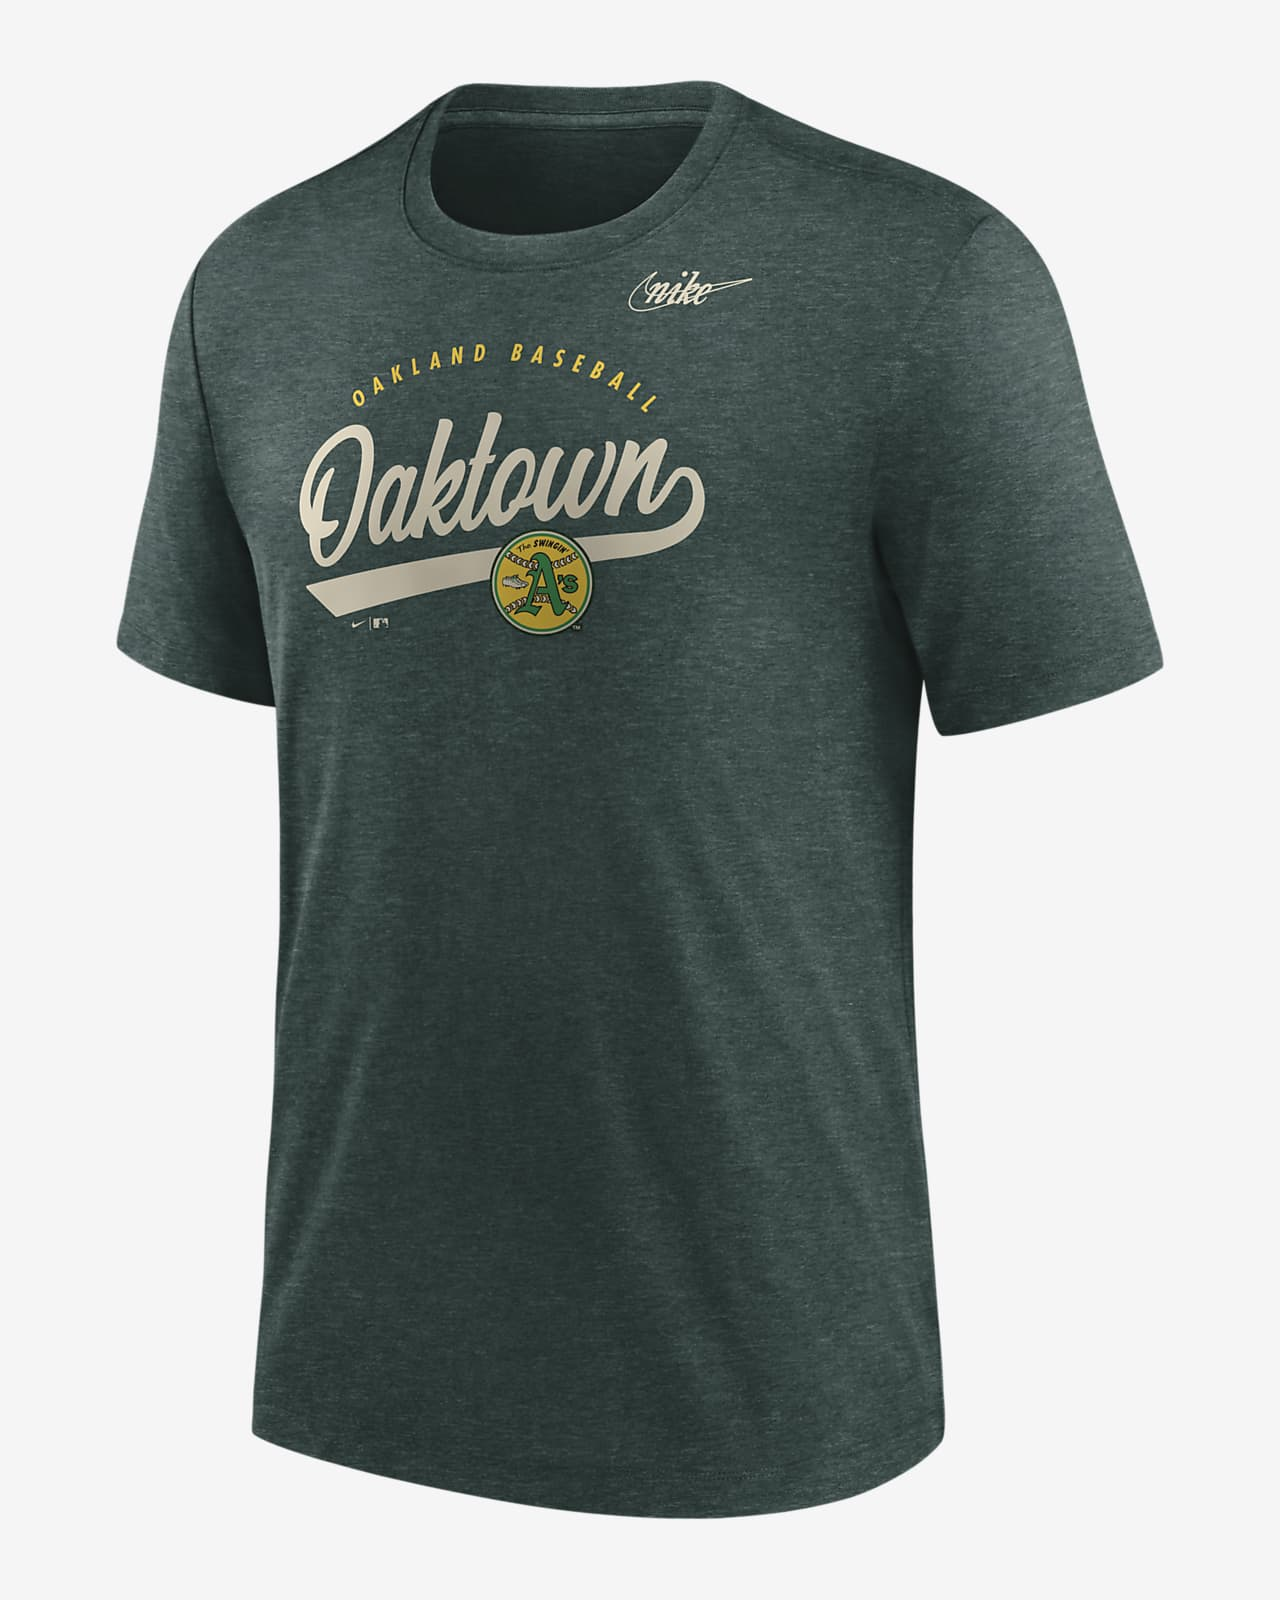 Nike Cooperstown Nickname (MLB Oakland Athletics) Men's T-Shirt